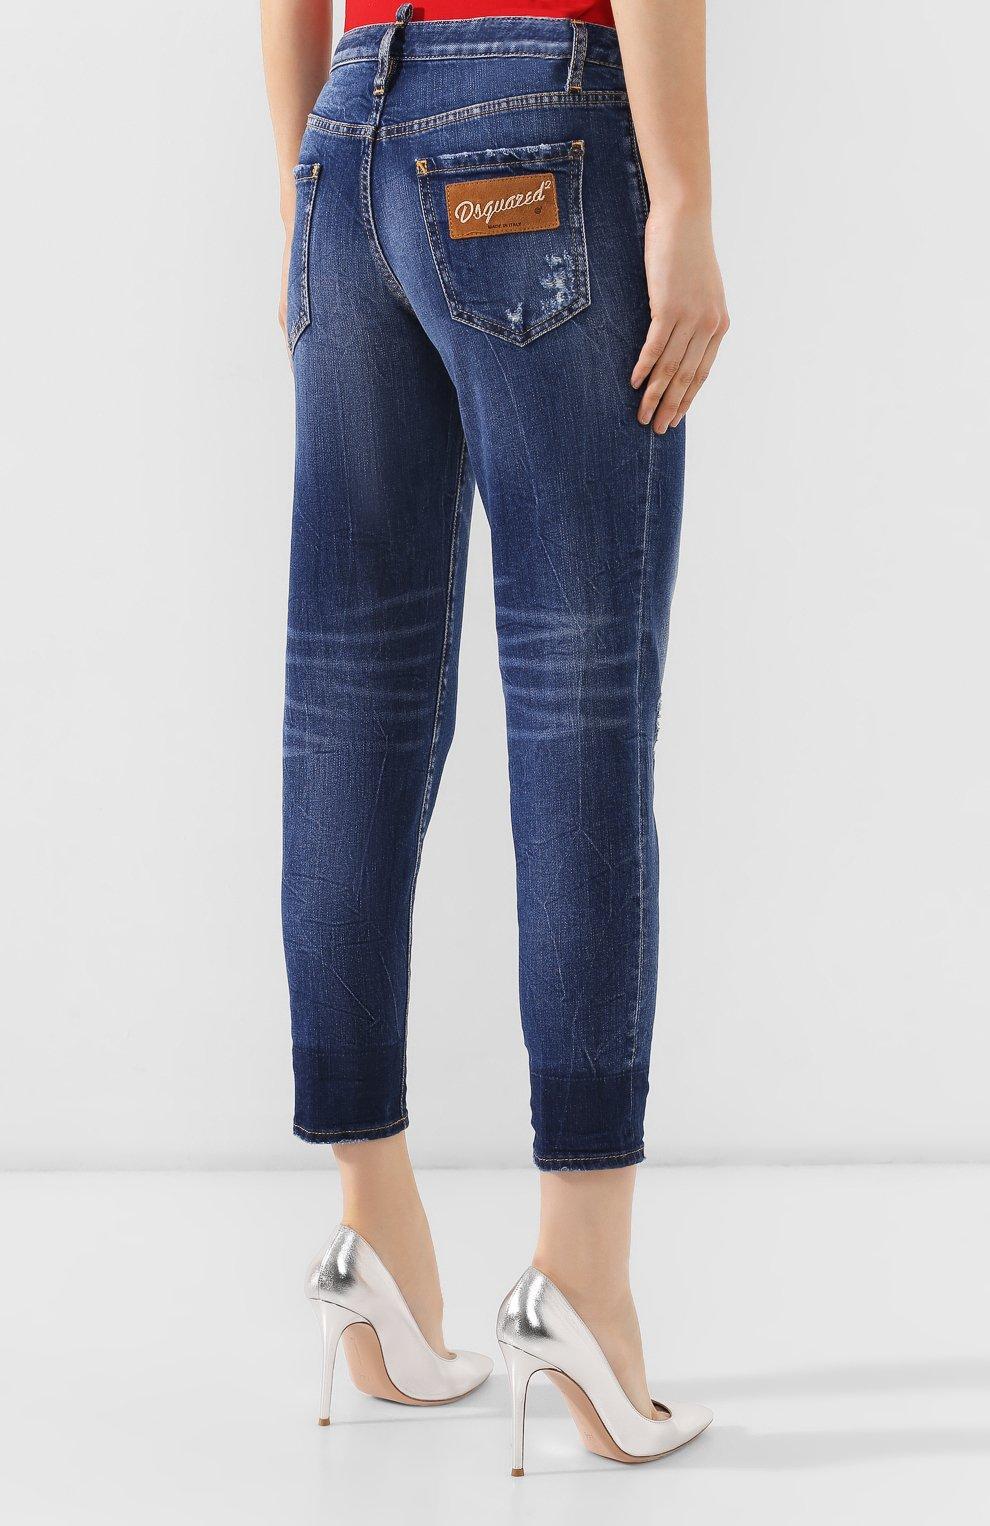 Женские джинсы DSQUARED2 синего цвета, арт. S72LB0214/S30663 | Фото 4